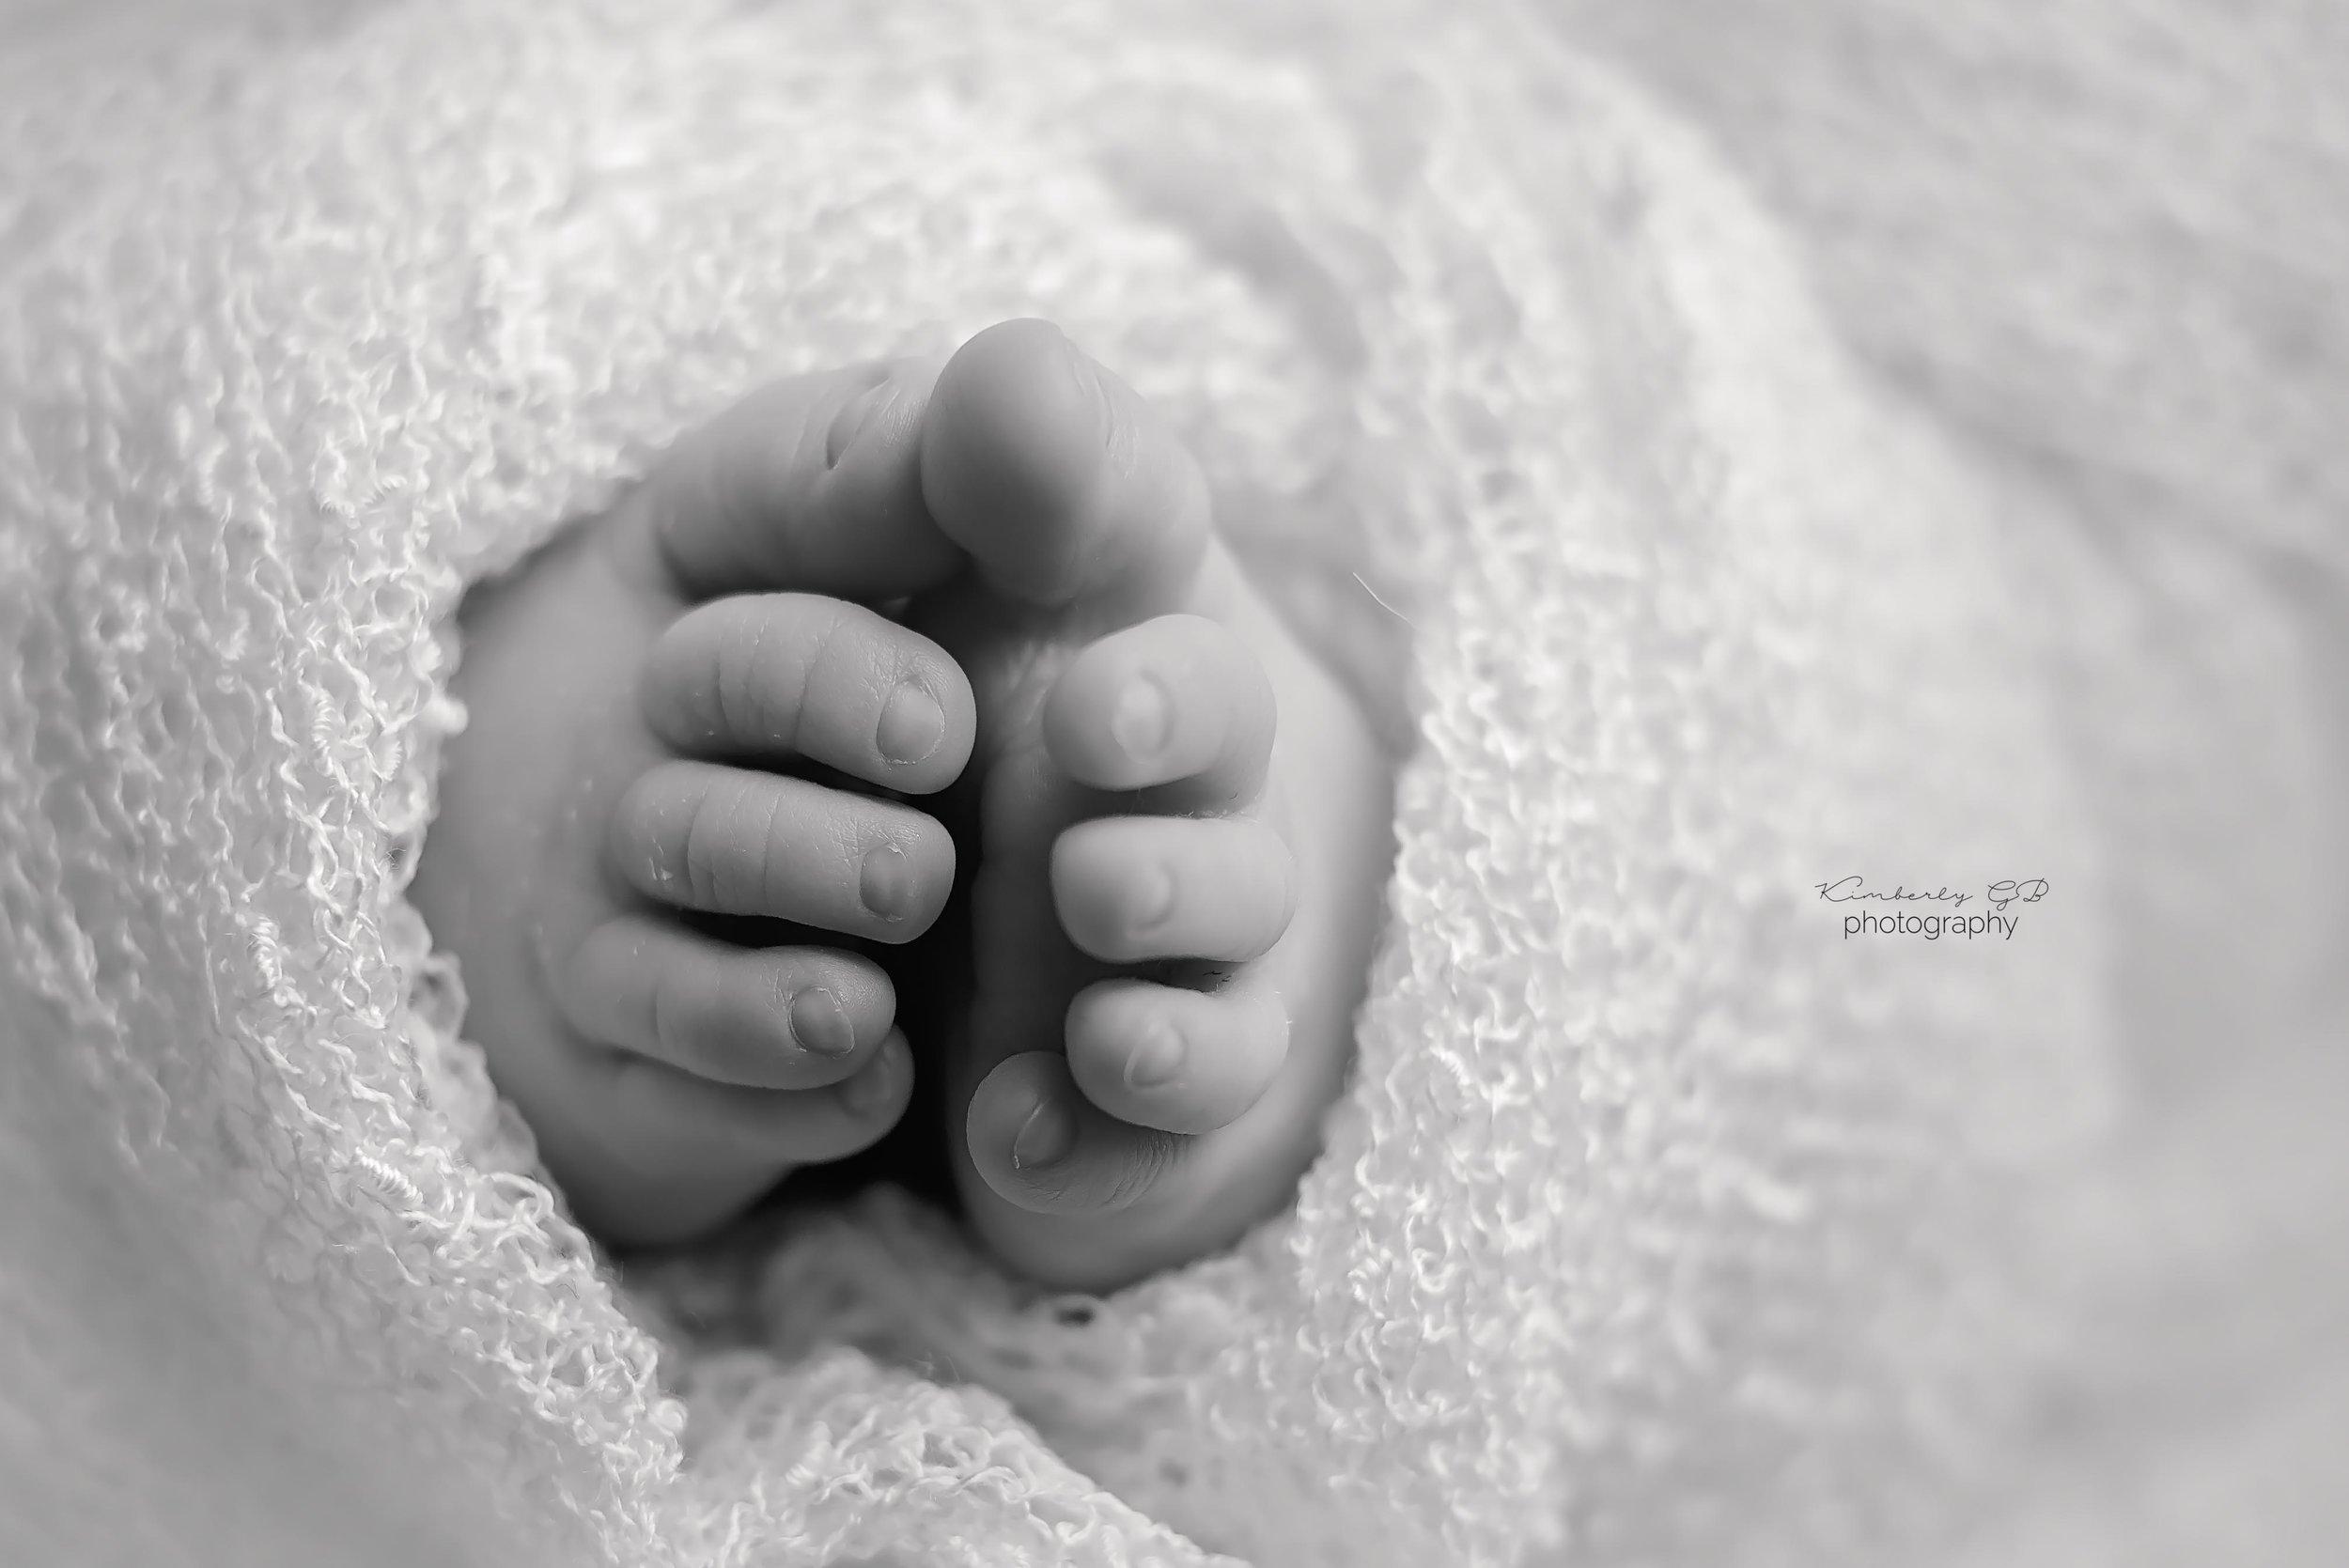 fotografia-de-recien-nacidos-bebes-newborn-en-puerto-rico-kimberly-gb-photography-fotografa-158.jpg